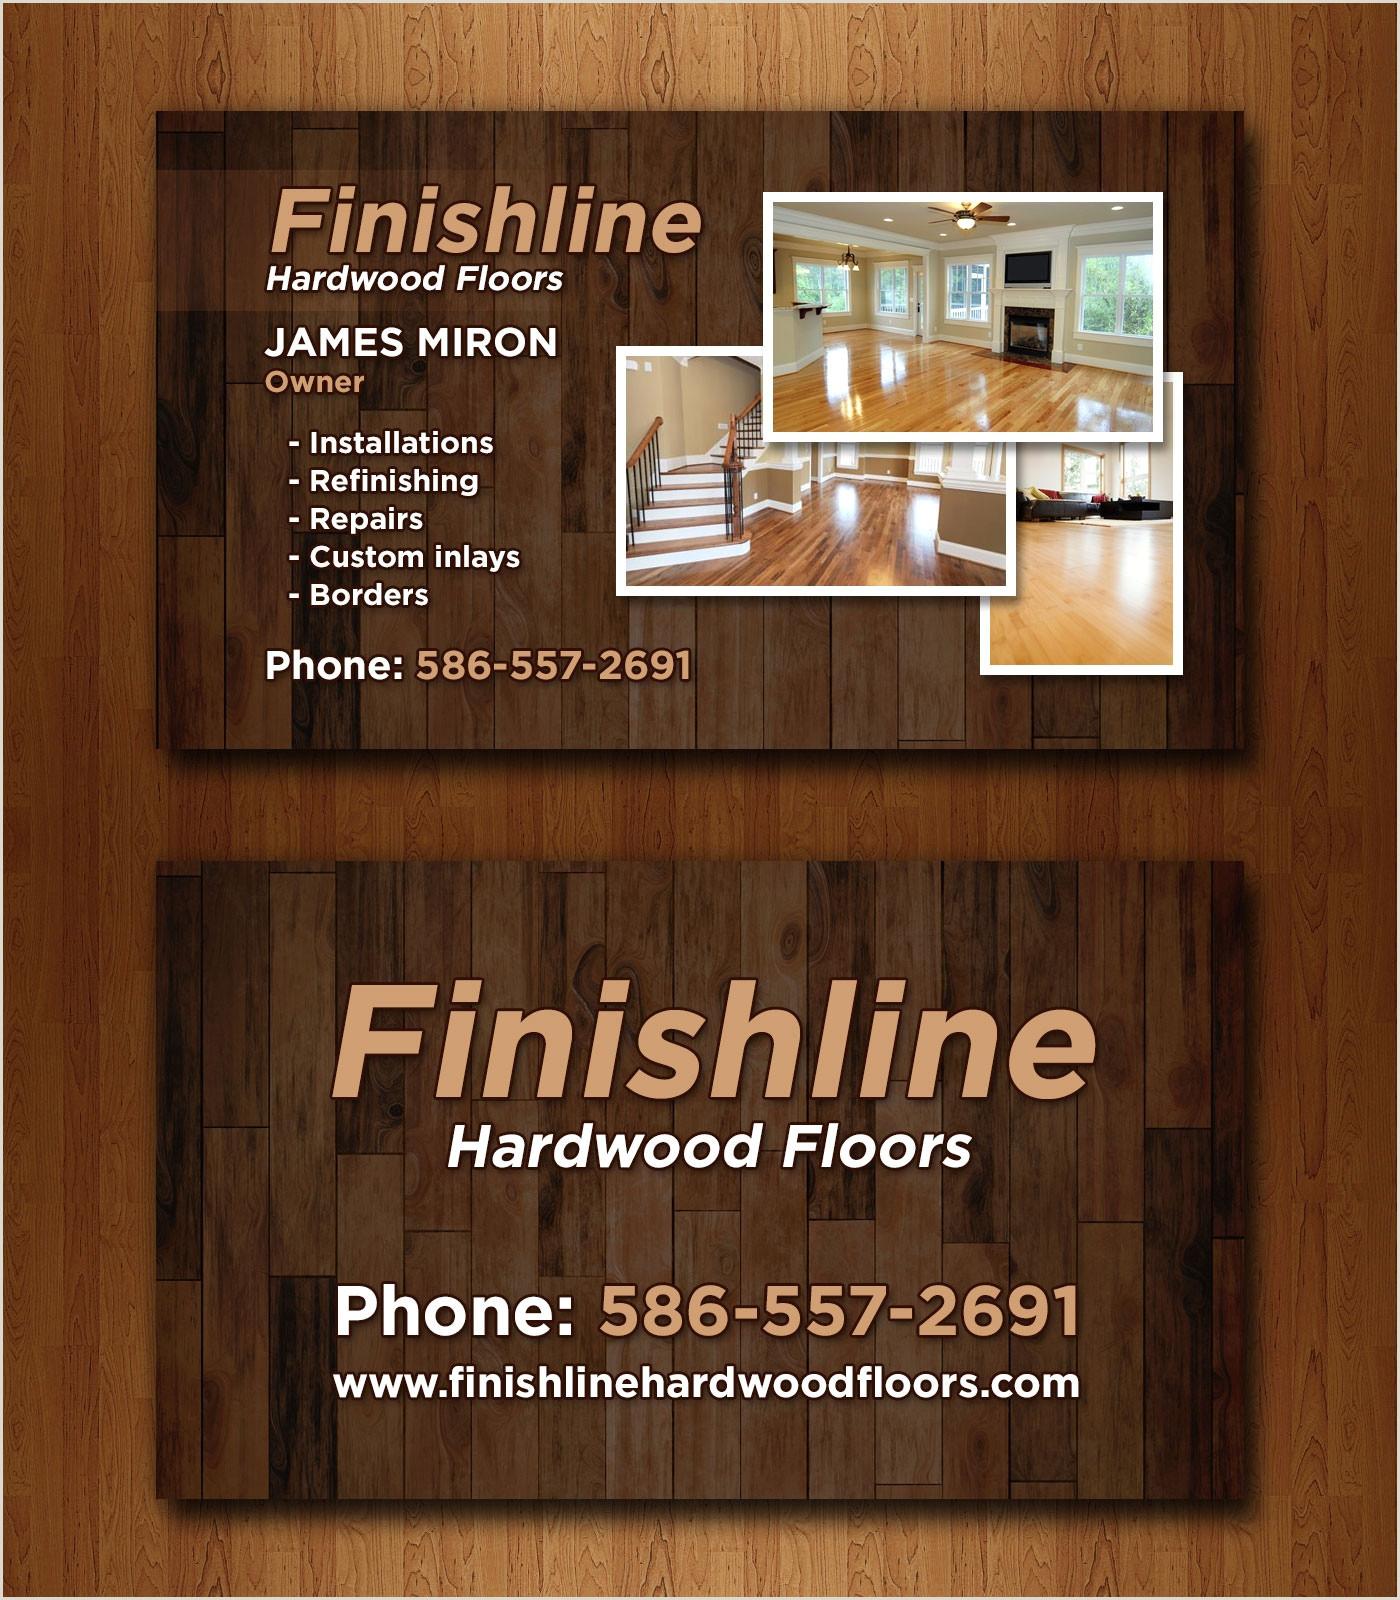 Sample Business Card Template 14 Popular Hardwood Flooring Business Card Template